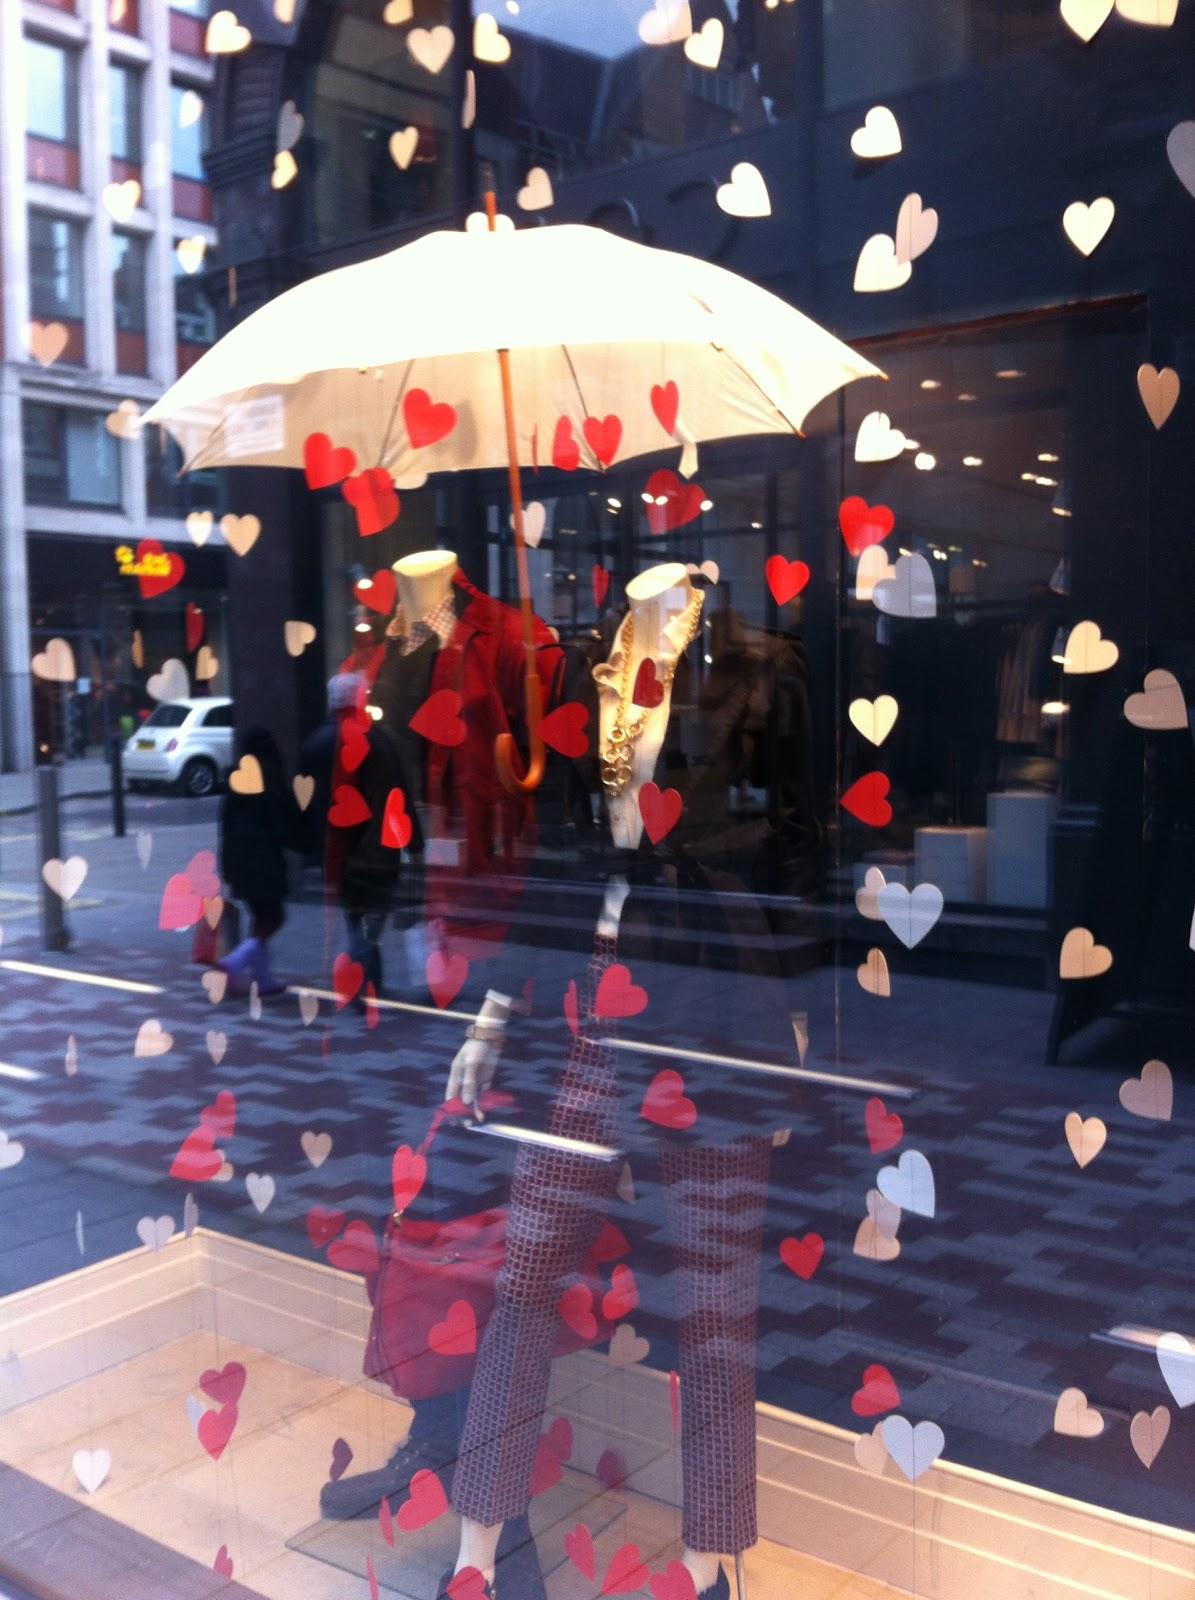 Marketing Monday Romantic Banana Republic Window Display